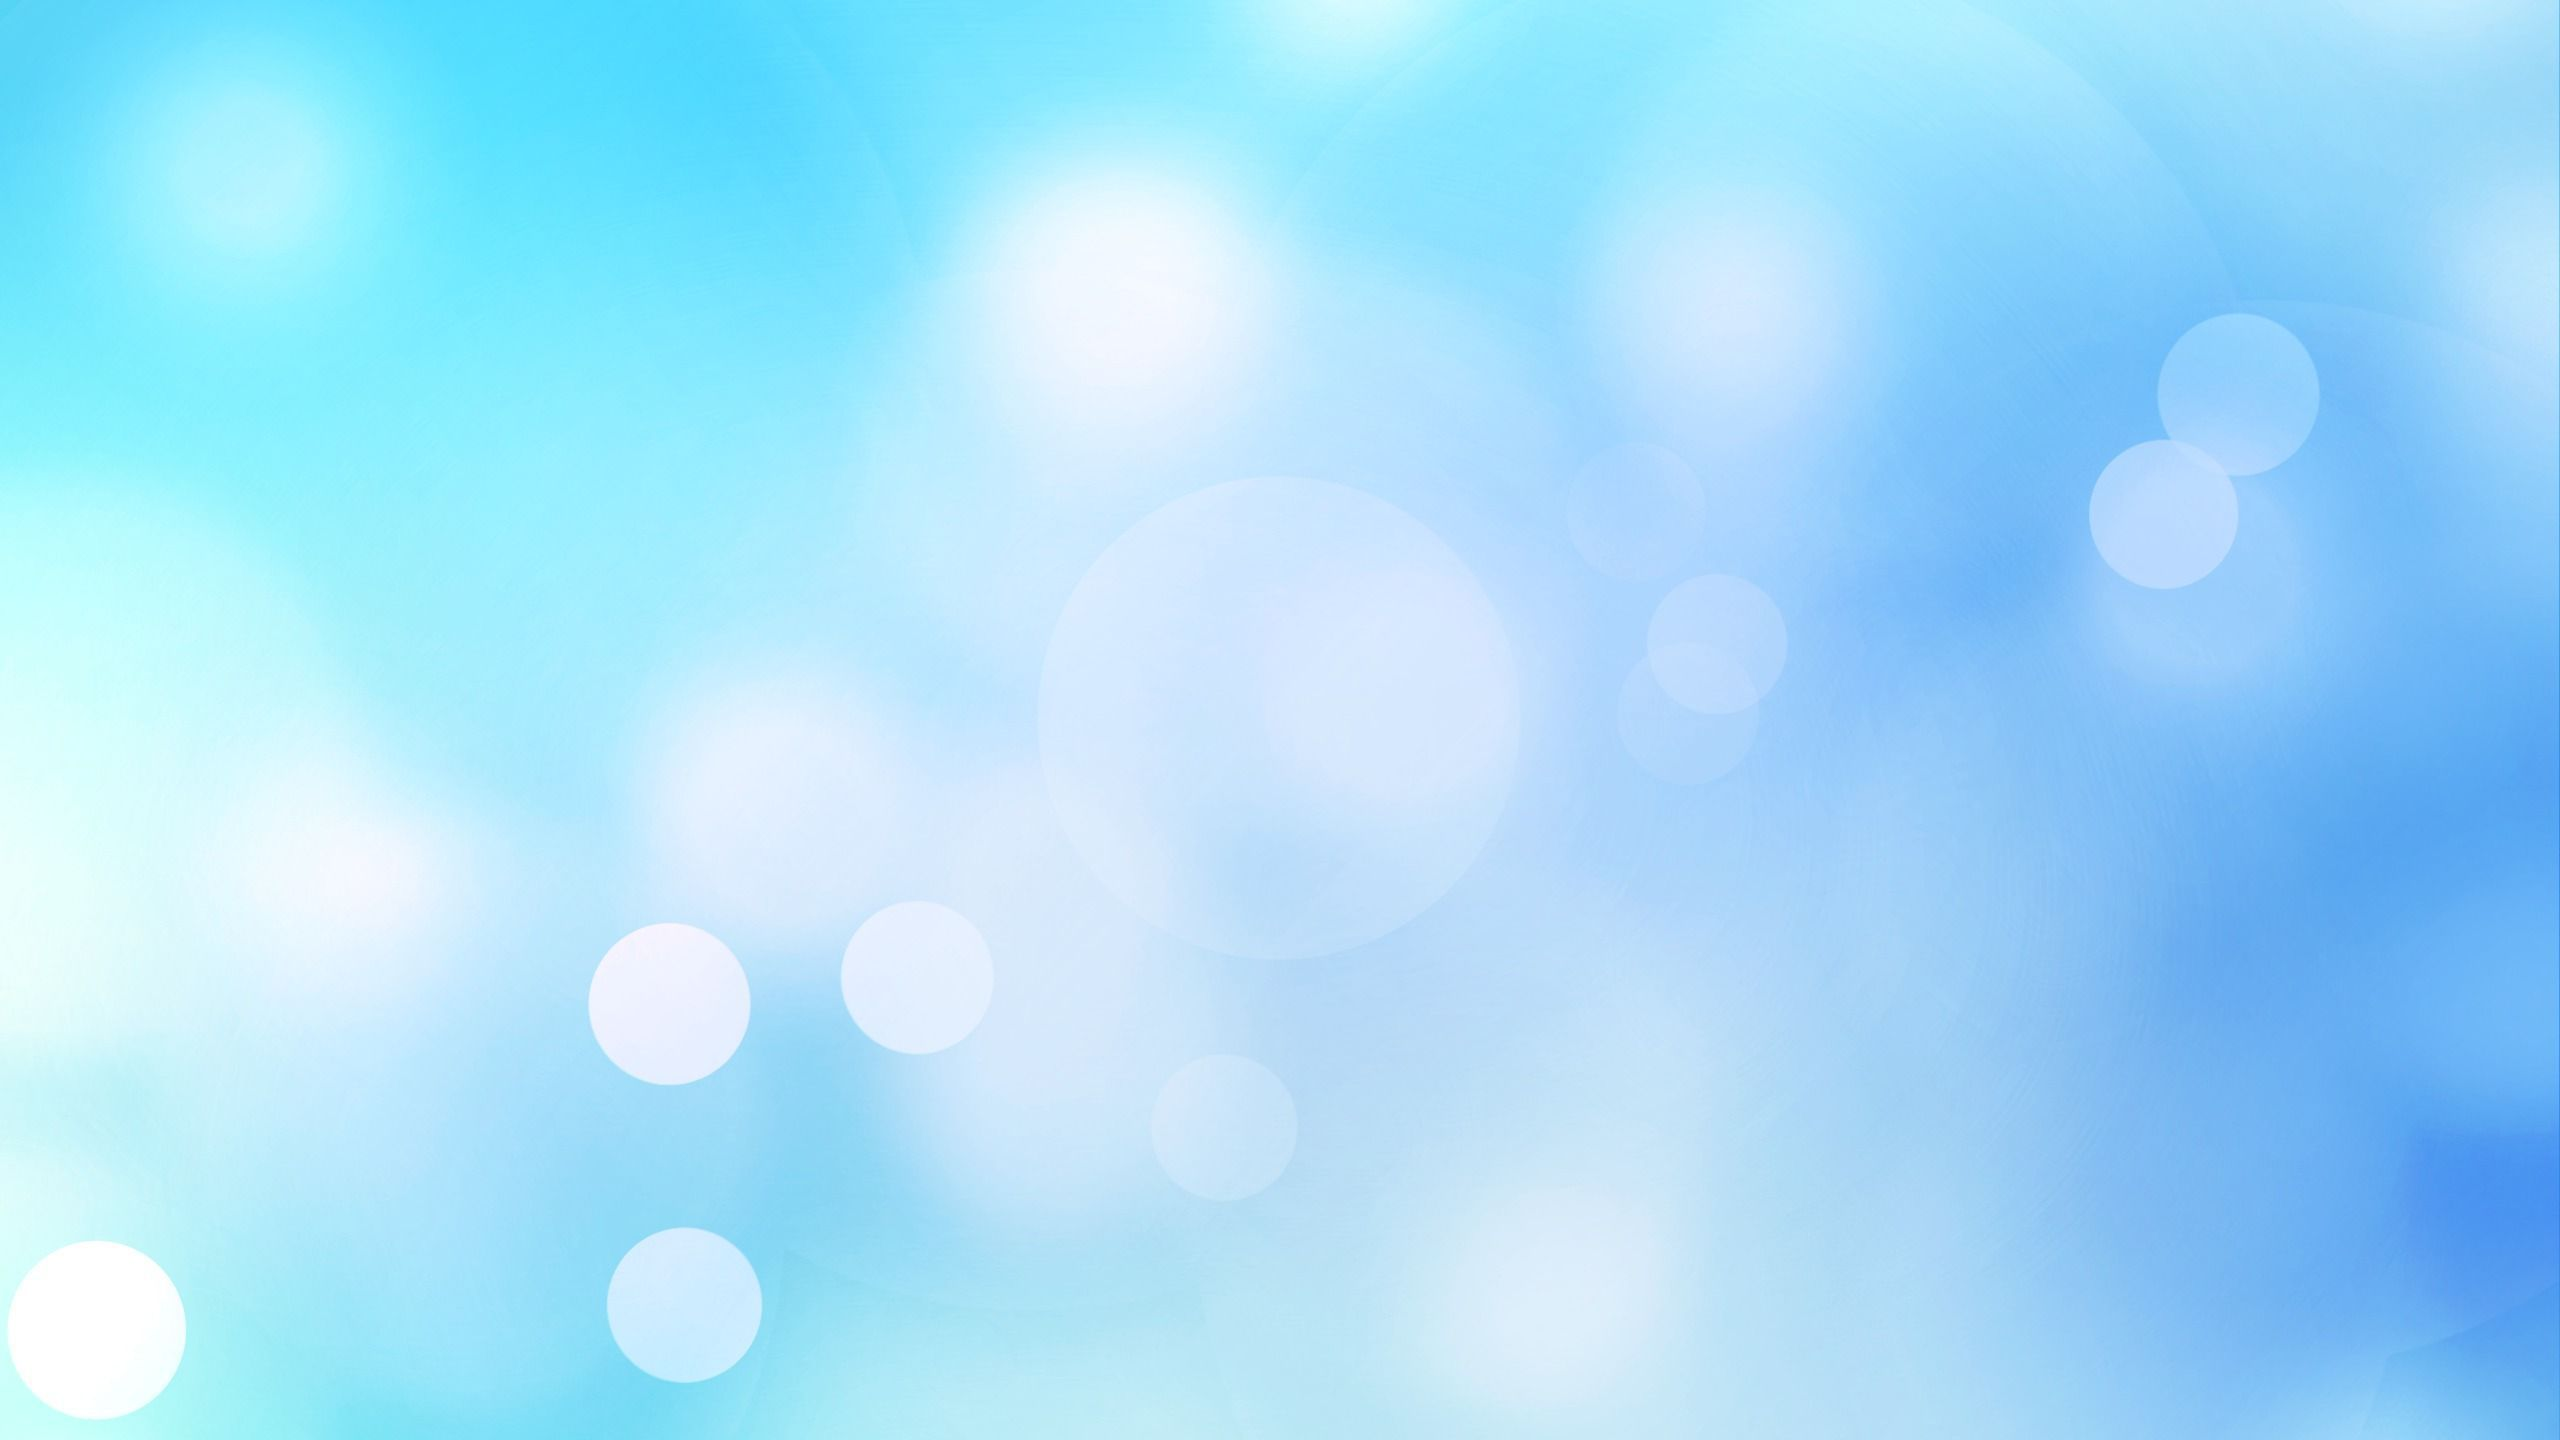 Light Blue Wallpaper Full Hd For Desktop Wallpaper With Images